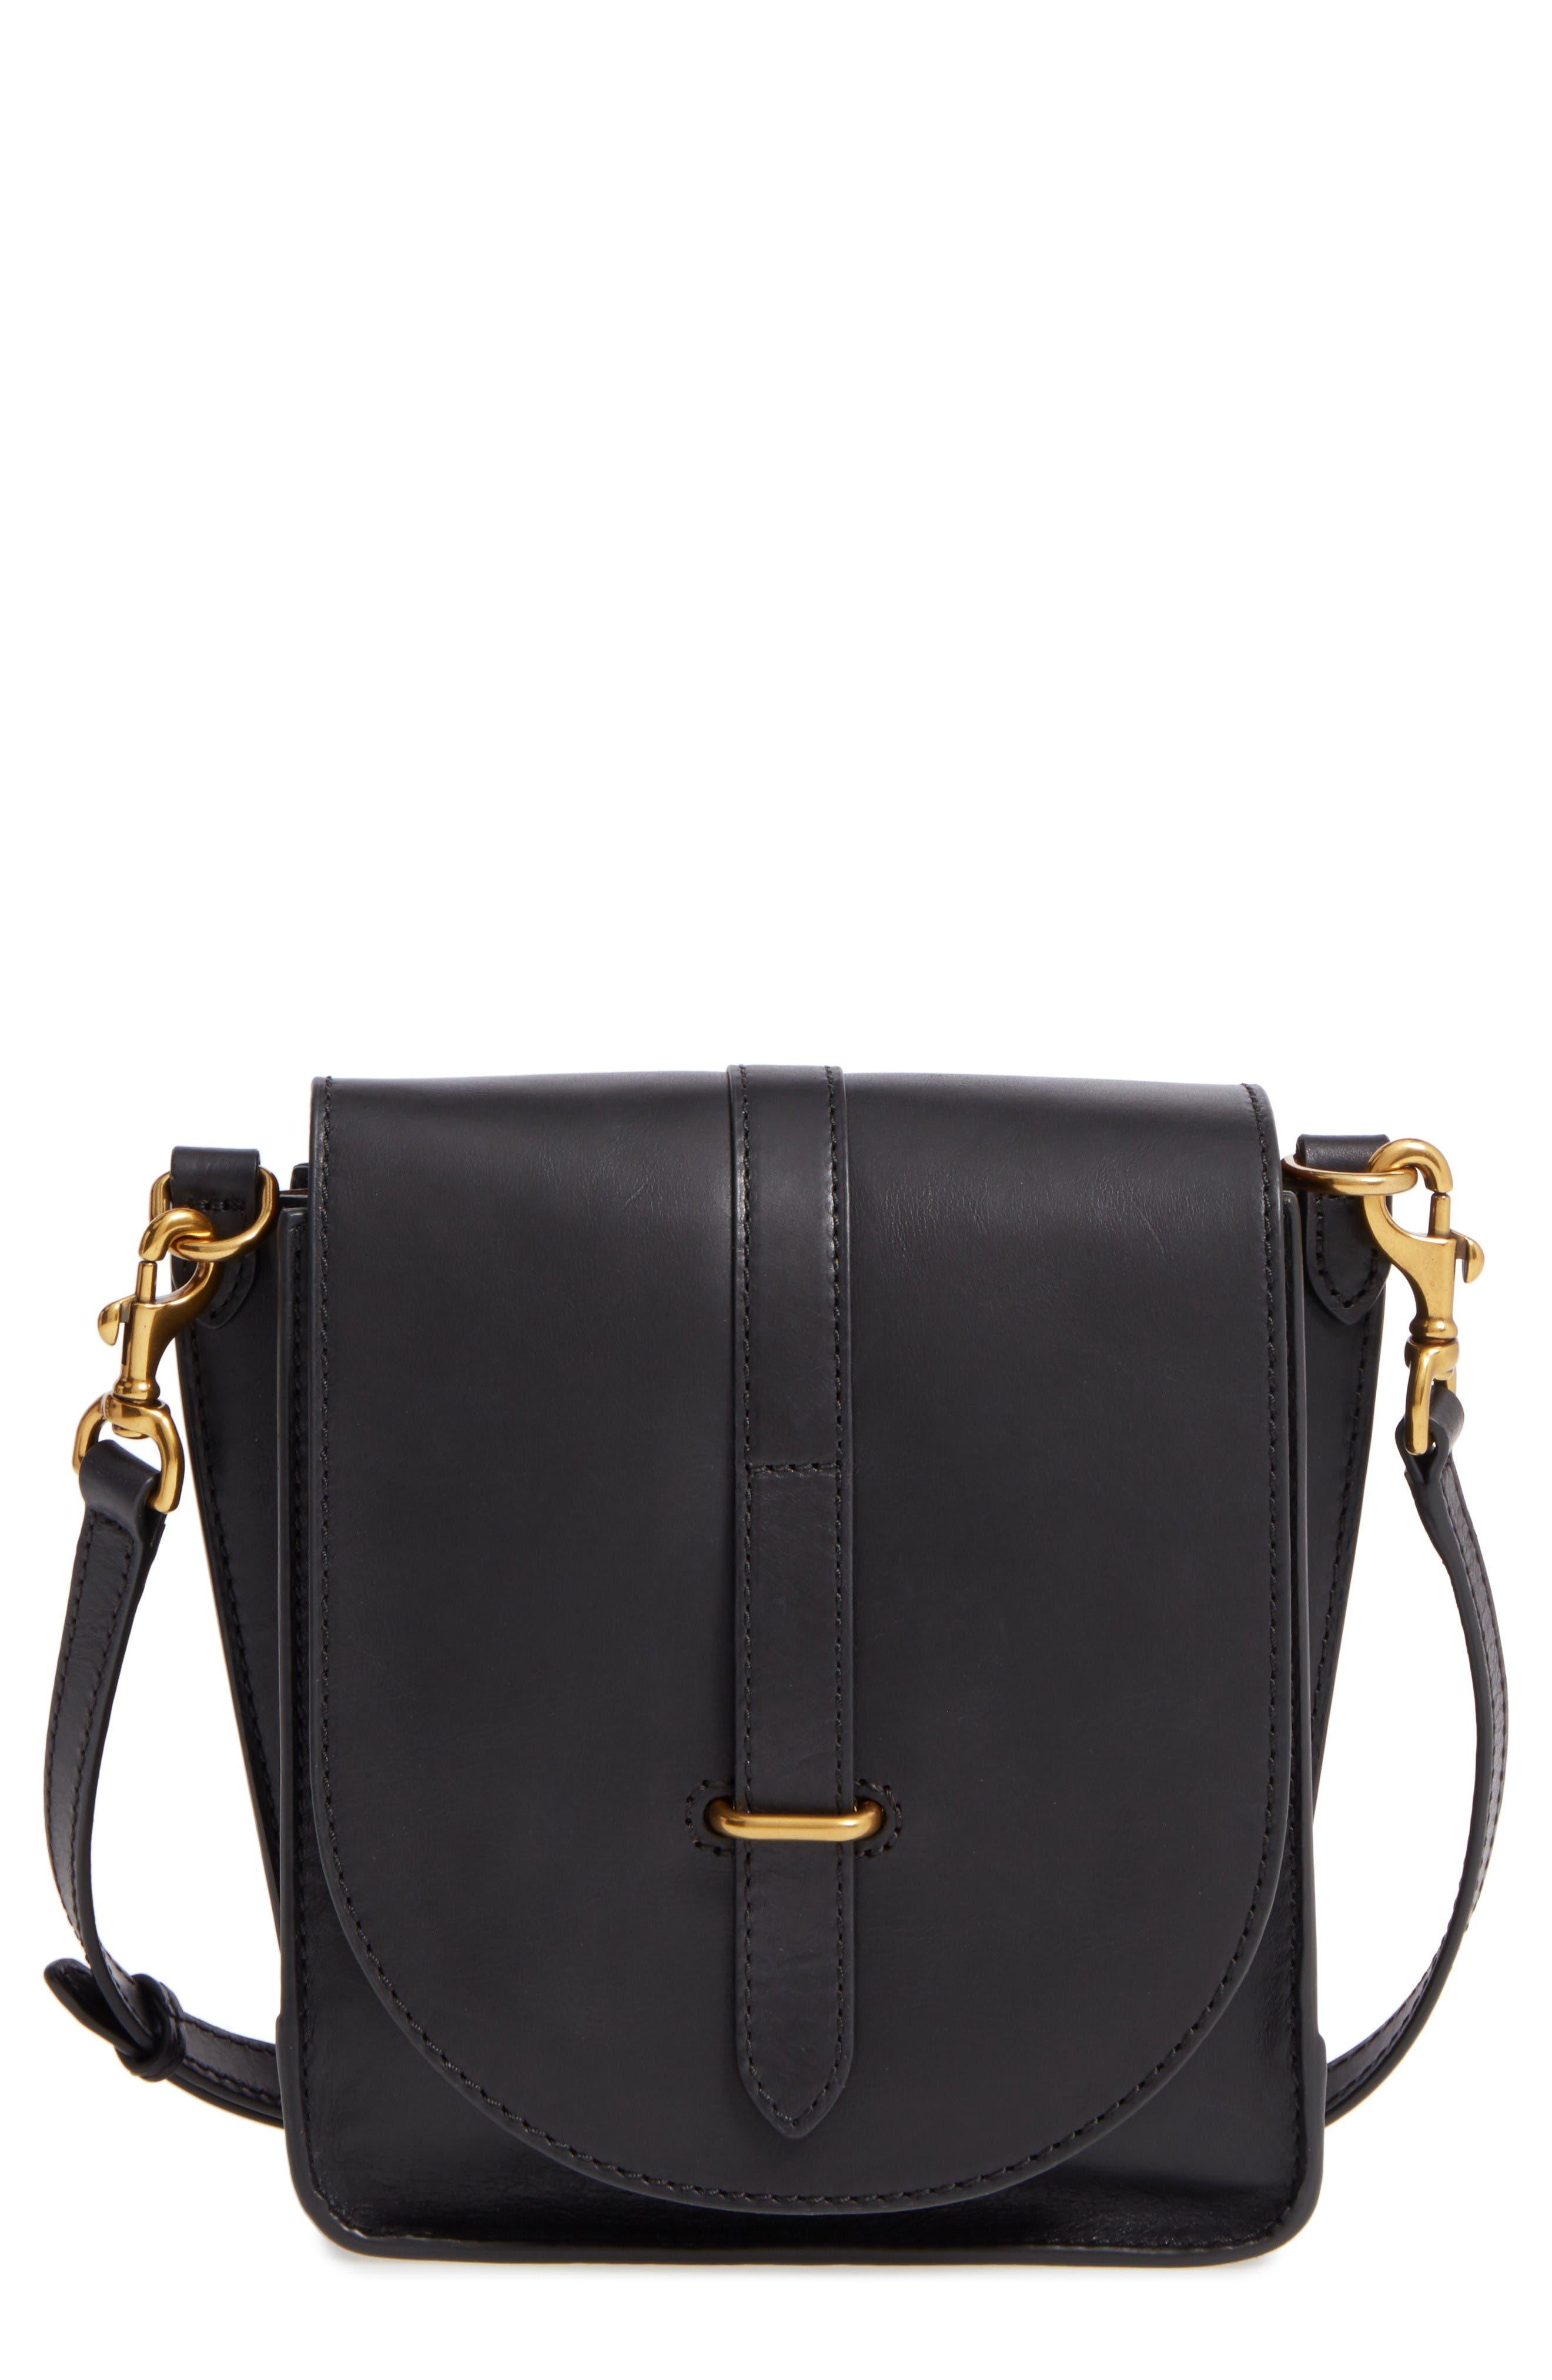 Frye Ilana Leather Crossbody Bag